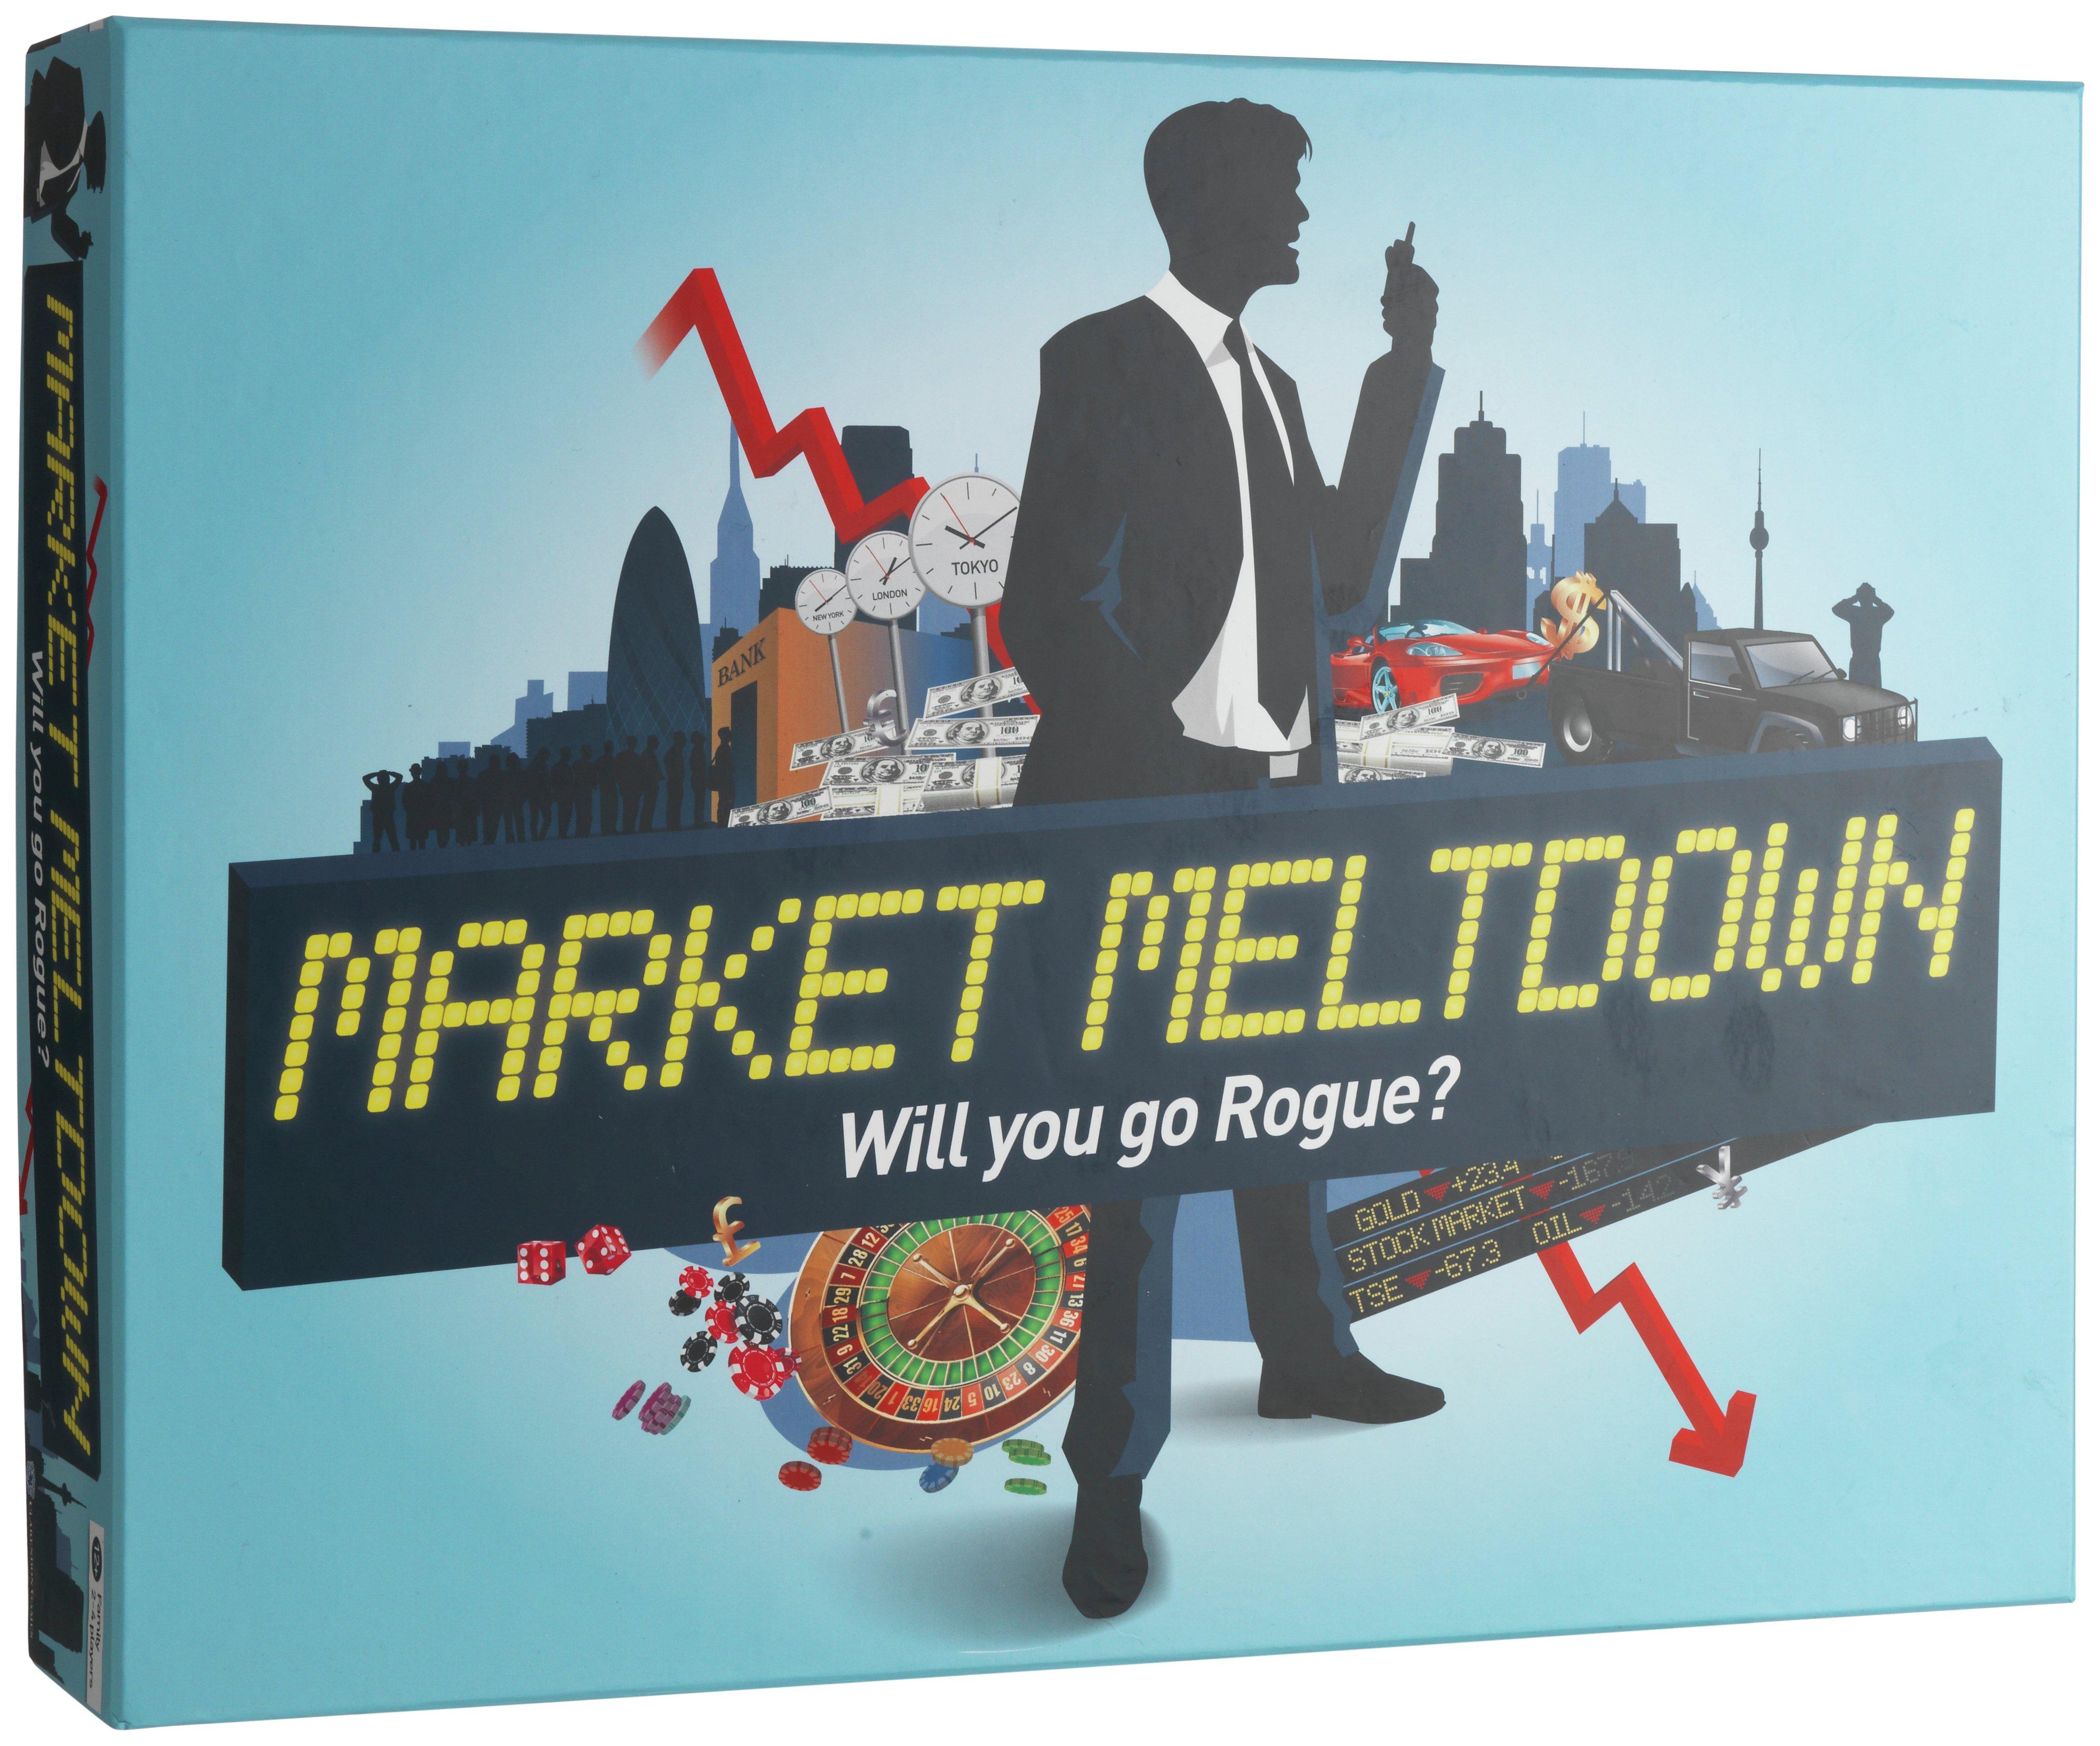 Image of Market Meltdown Game.